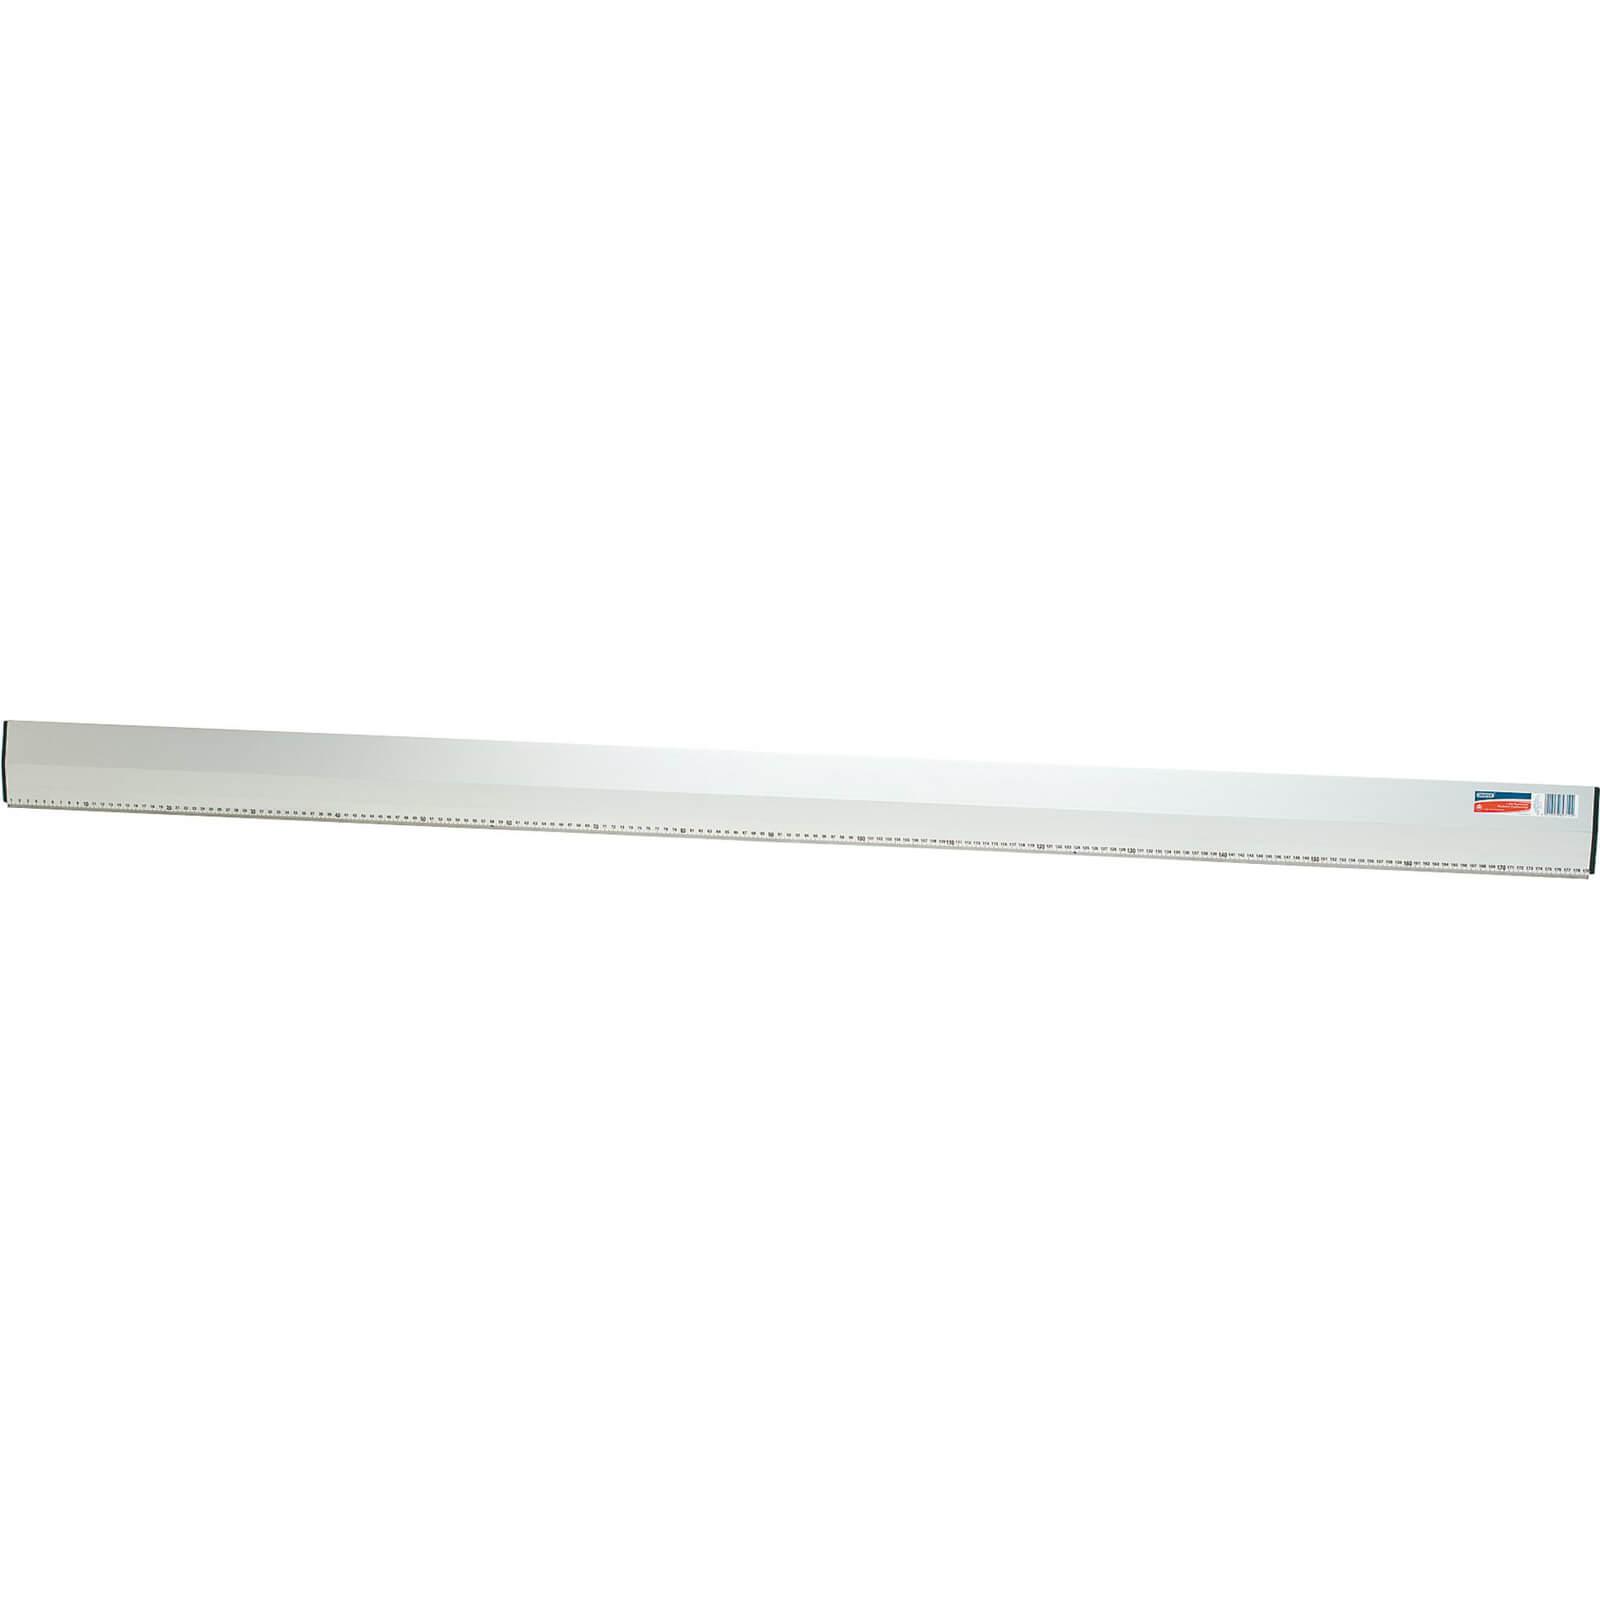 Image of Draper Plasterers Feather Edge 1.8m